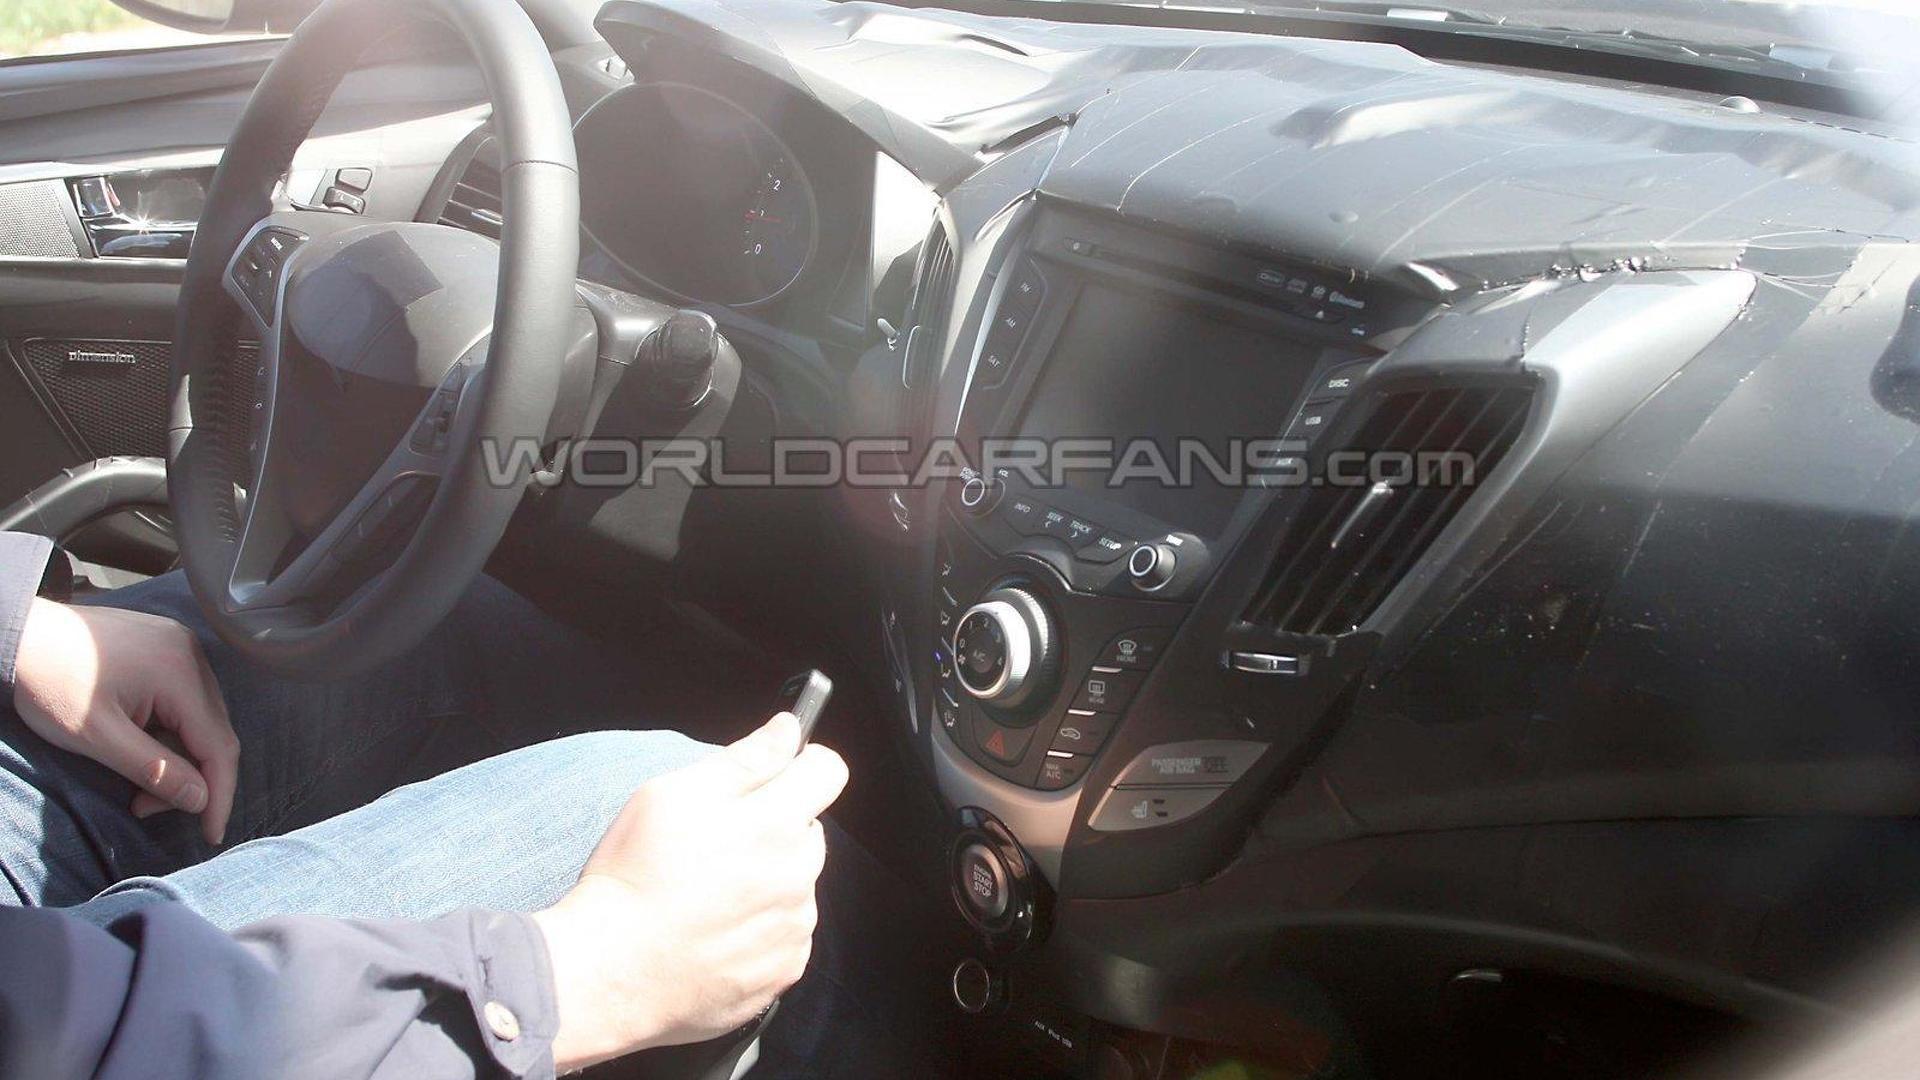 2012 Hyundai Veloster latest spy photos - first interior shot